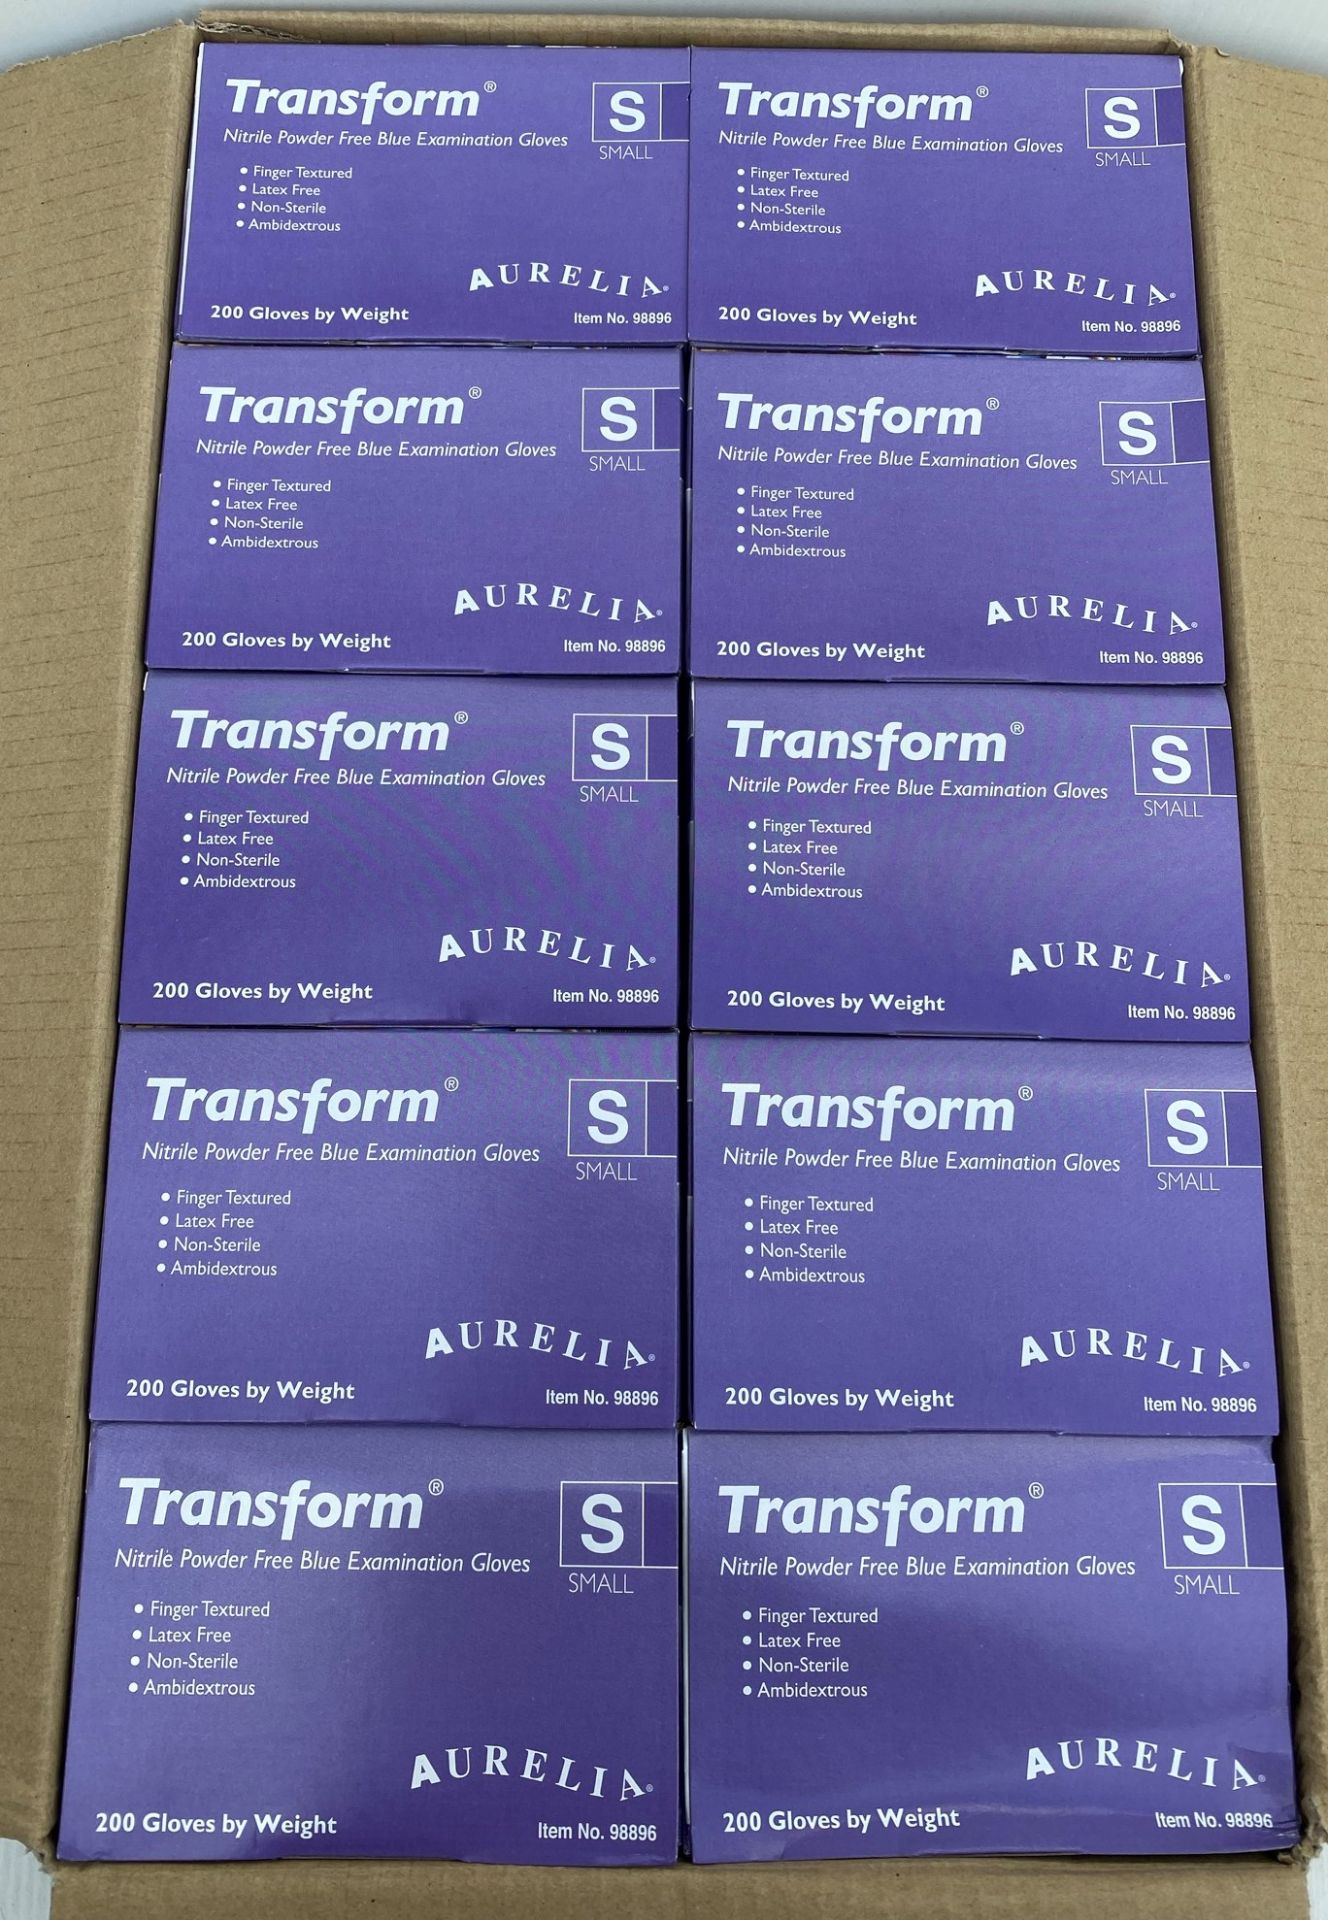 10 x boxes of 200 x Aurelia Transform Nitrile Powder Free Blue Examination Gloves - Size Small - - Image 2 of 4